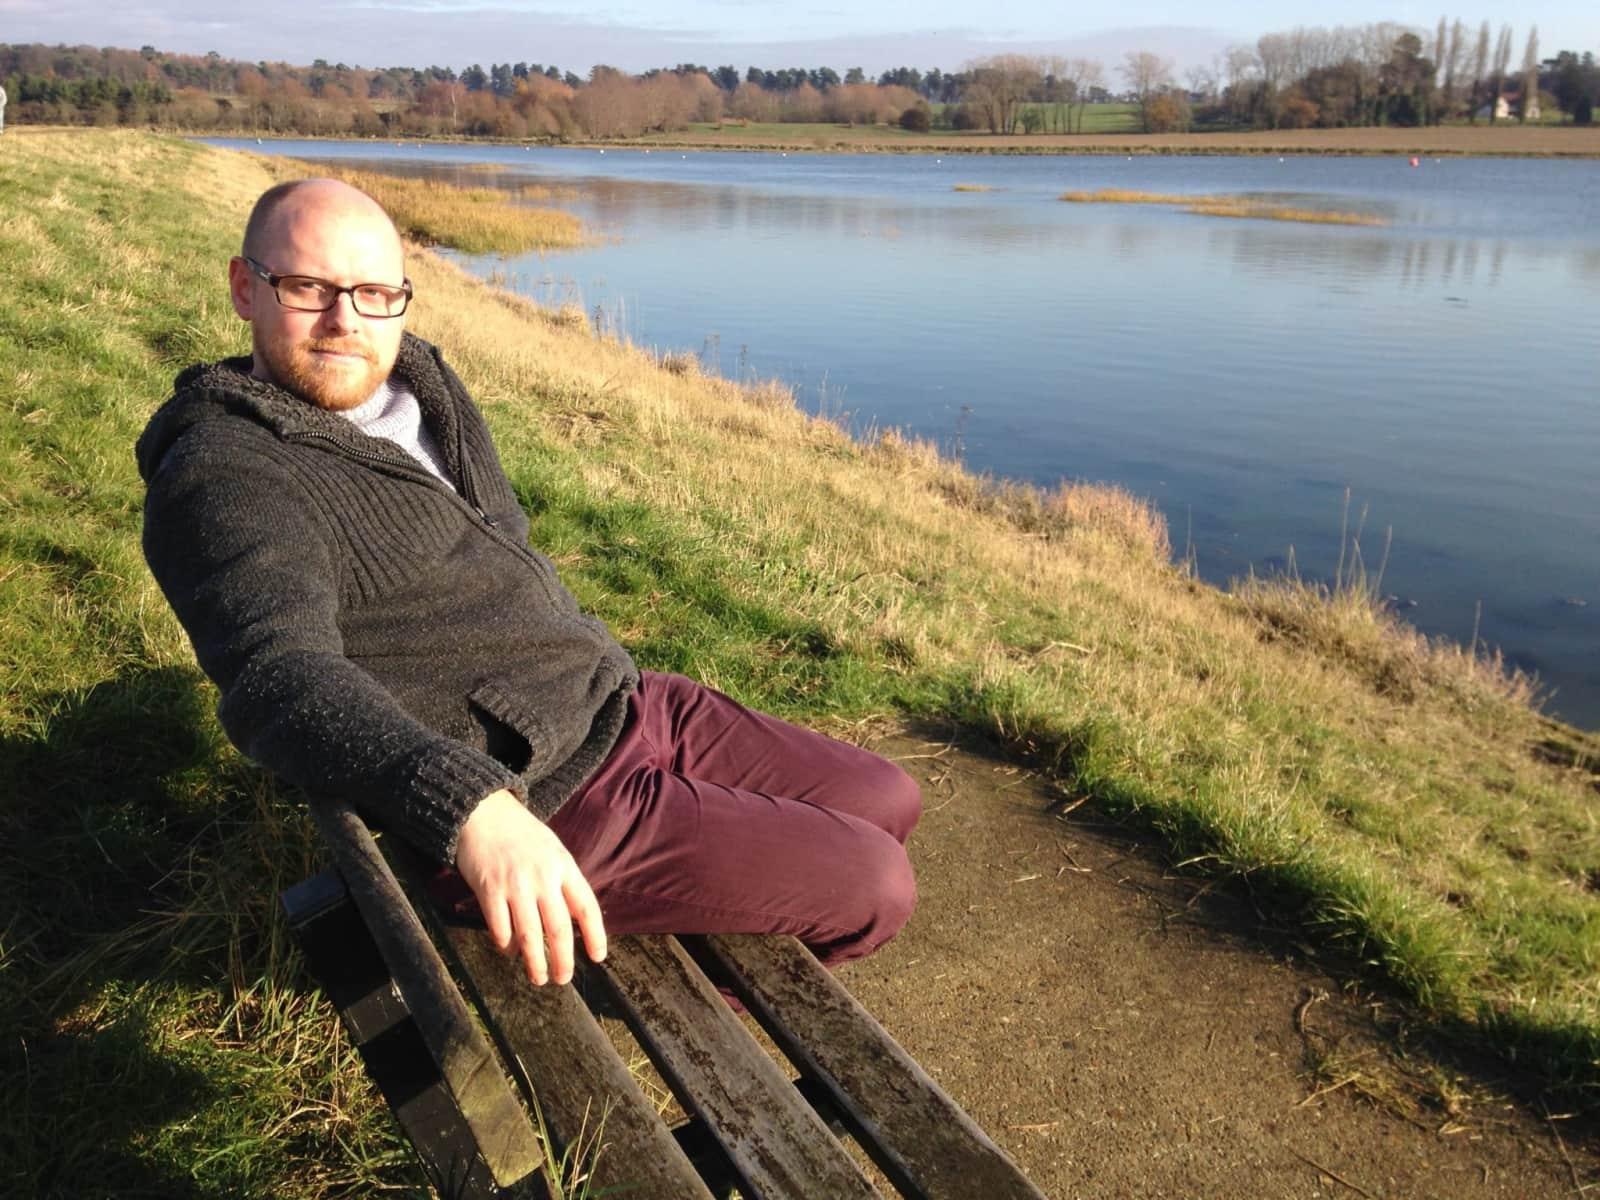 Philip from Ipswich, United Kingdom